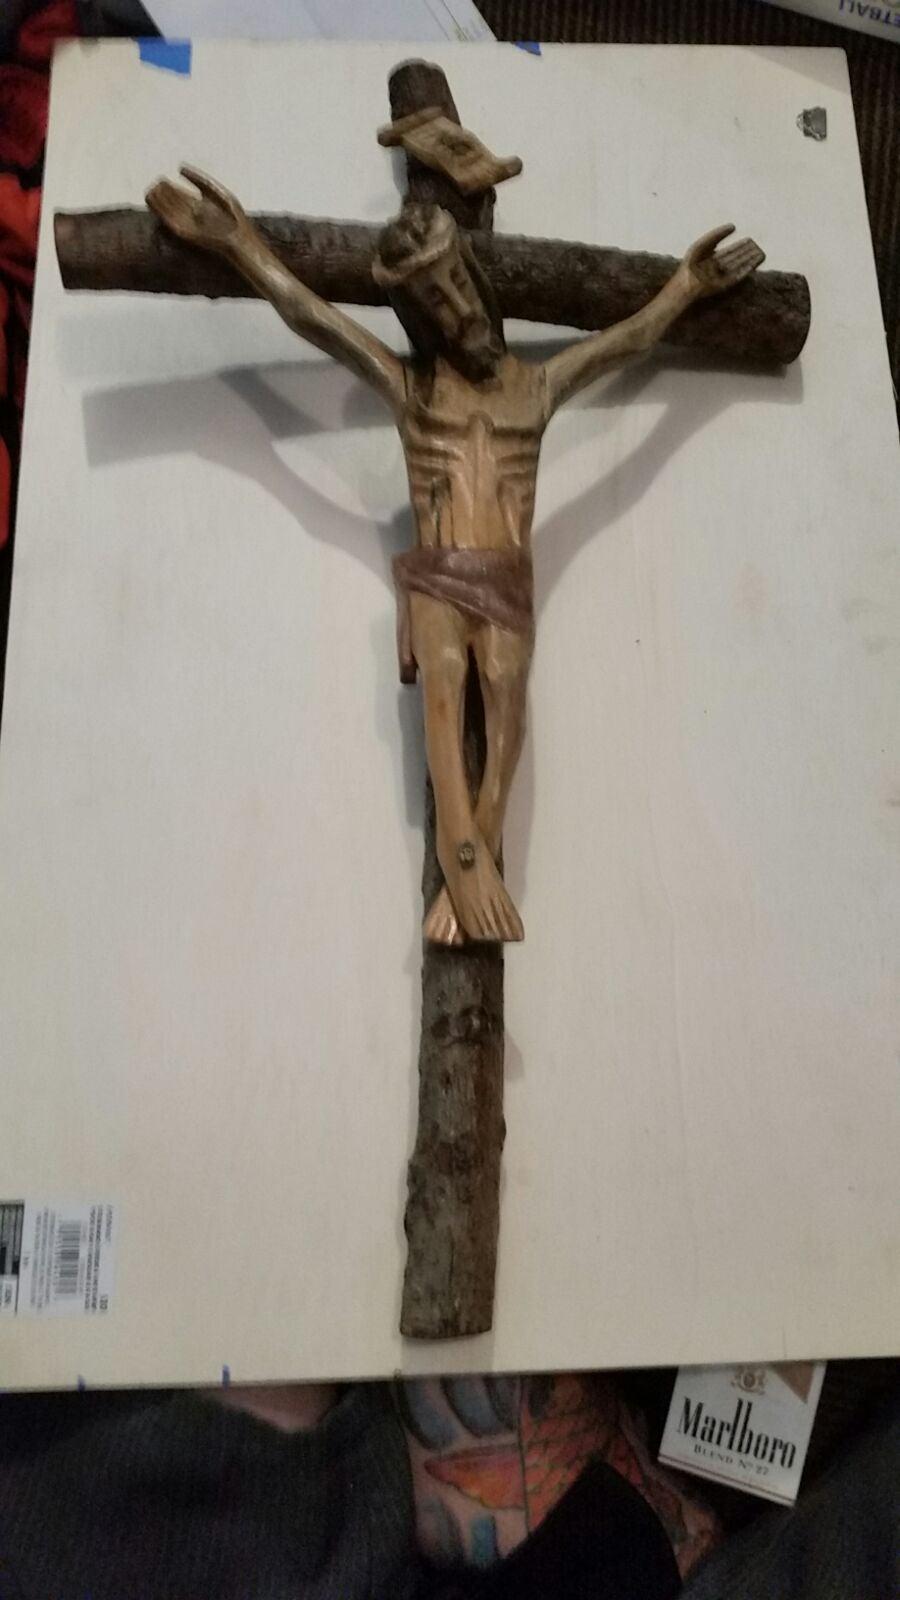 Antique French crucifix